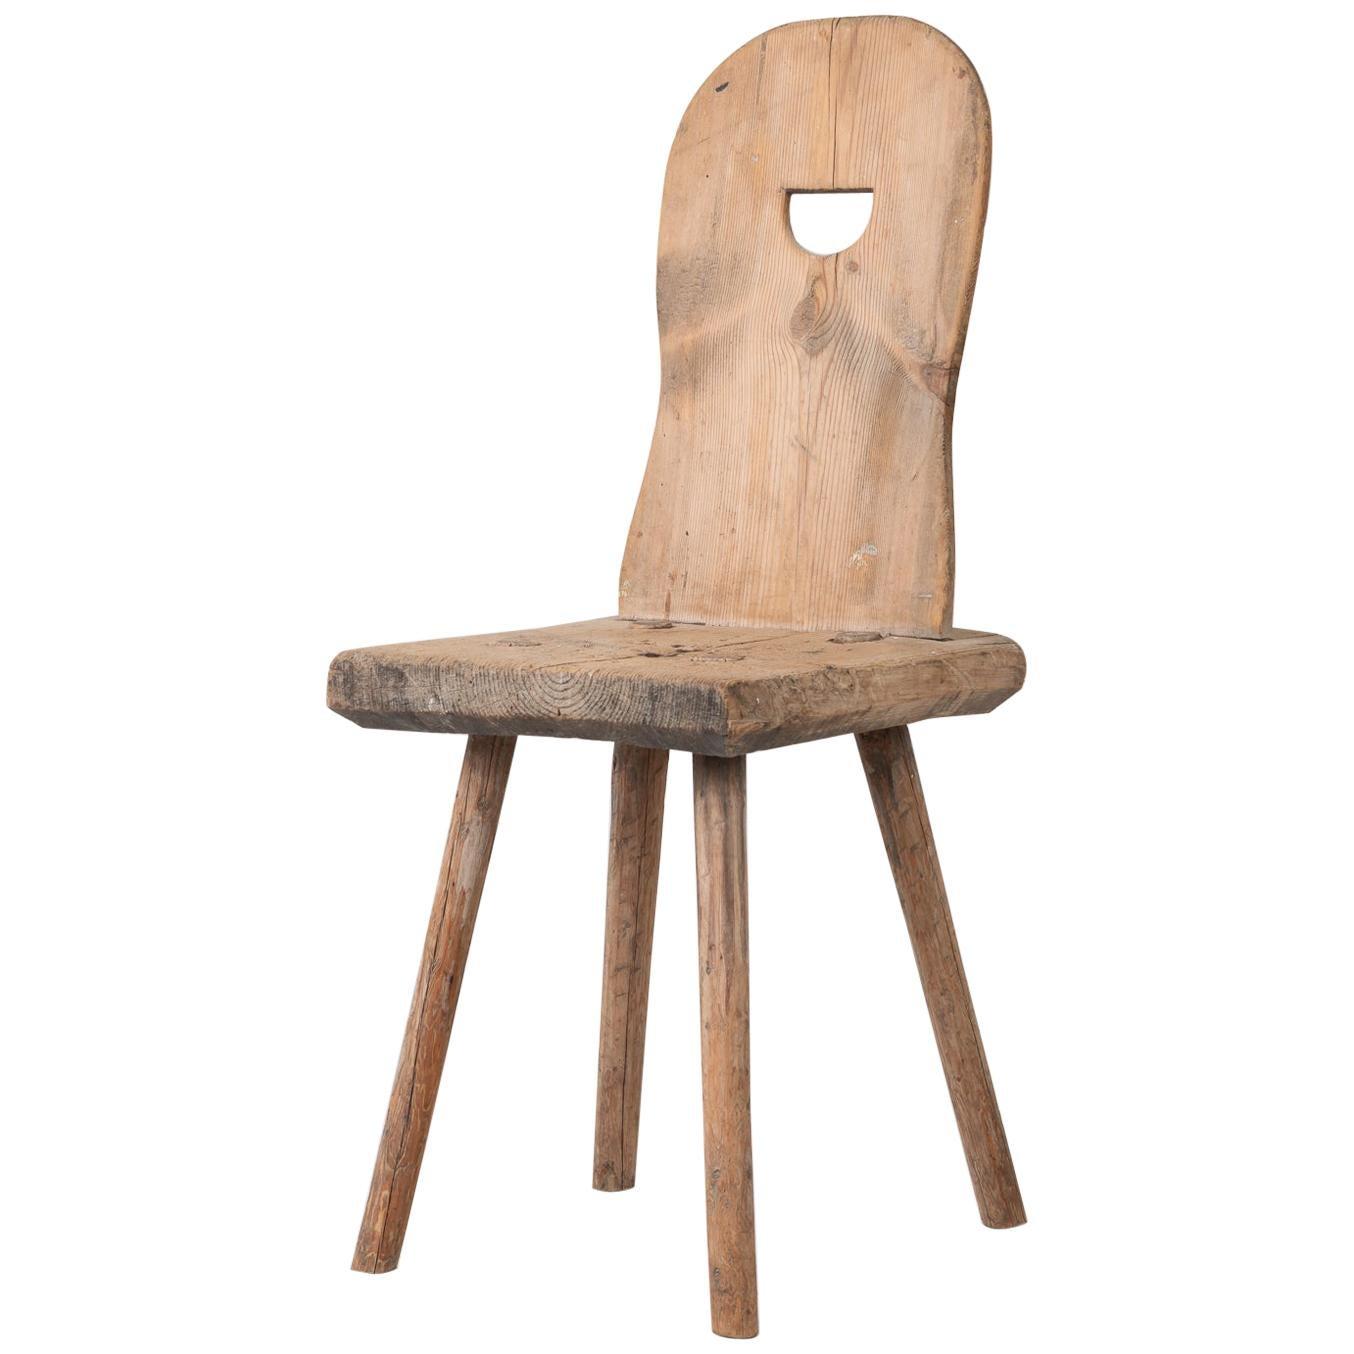 19th Century Swedish Folk Art Rustic Chair